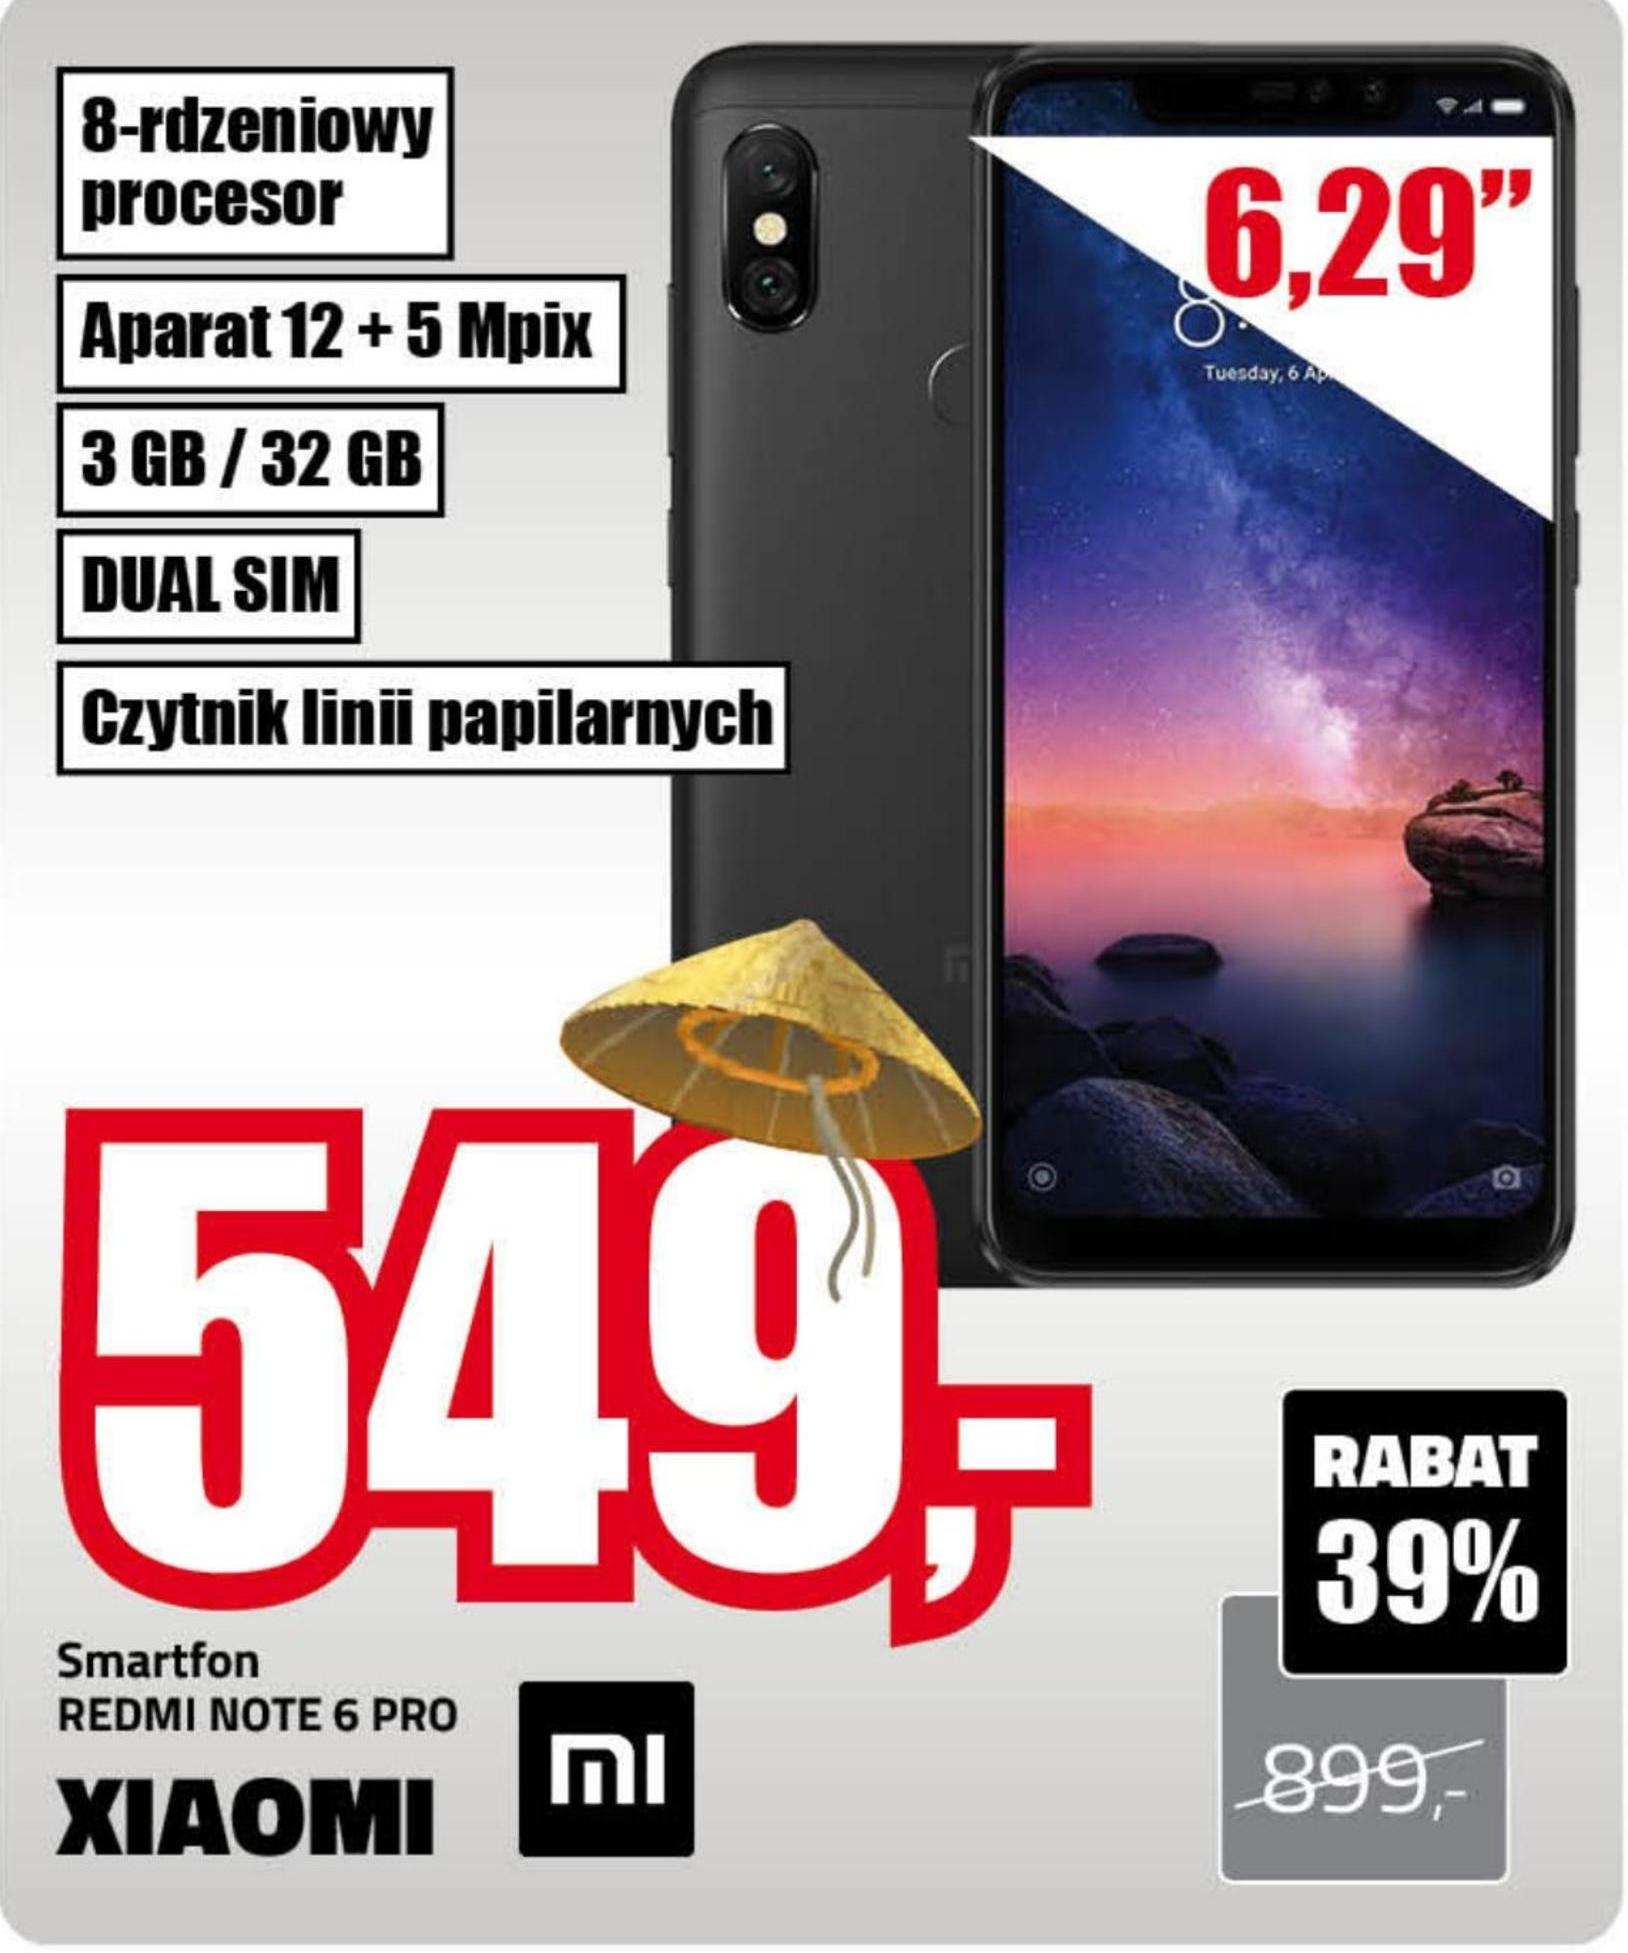 Smartfon Redmi Note 6 Pro Xiaomi niska cena